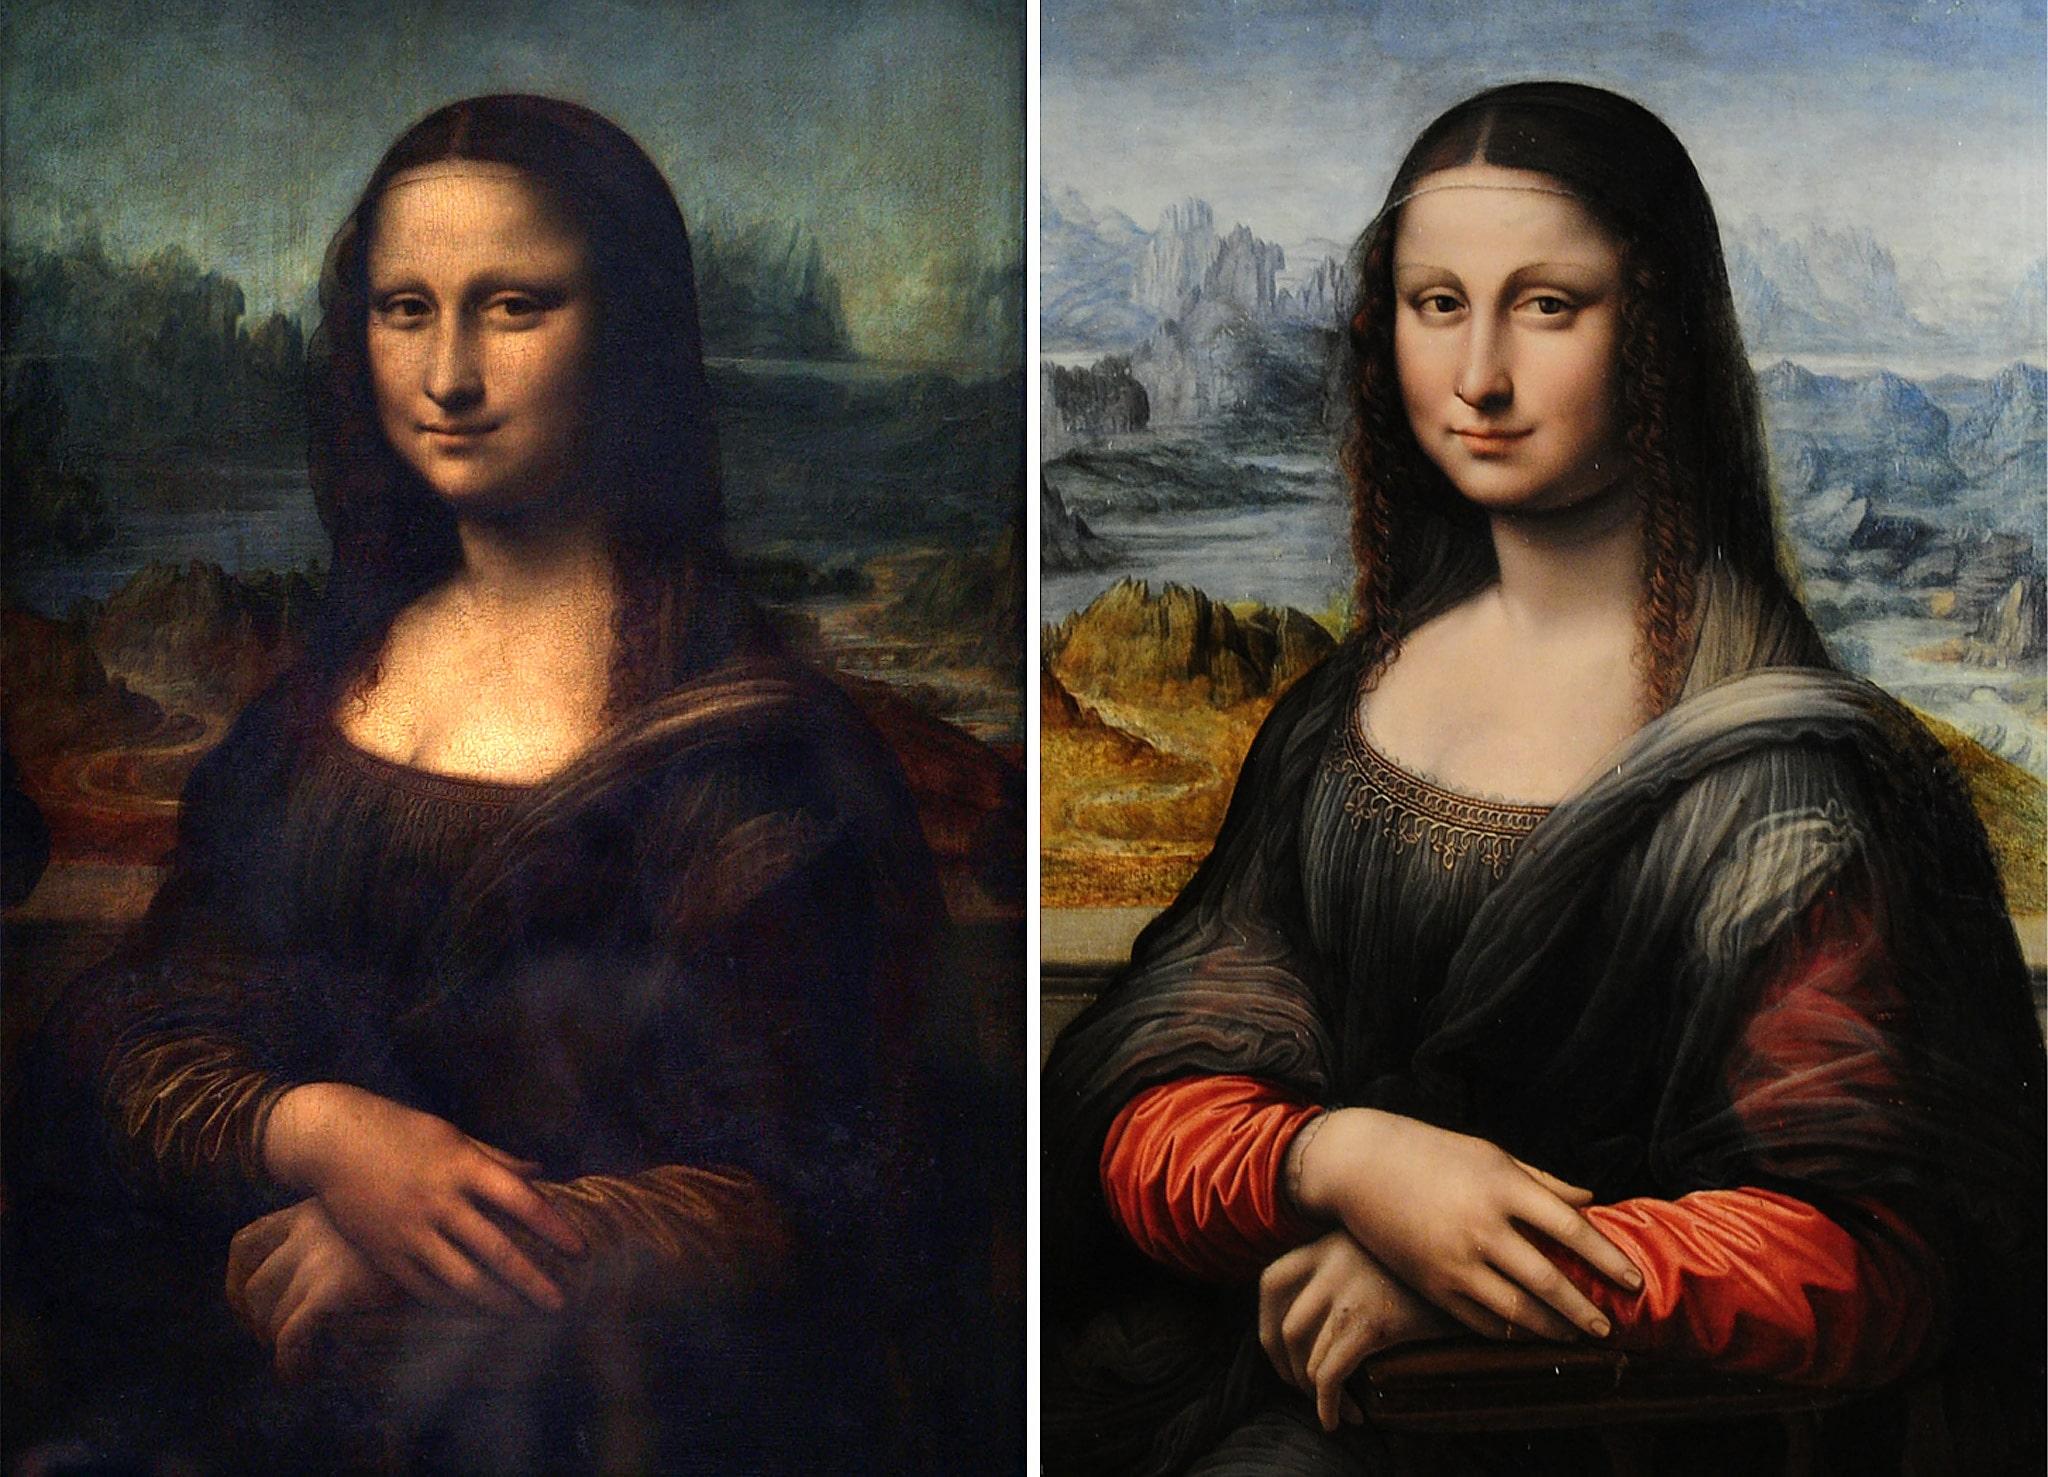 Mona-Lisa-Masolat-Leonardo-Da-Vinci-Raymond-Hekking